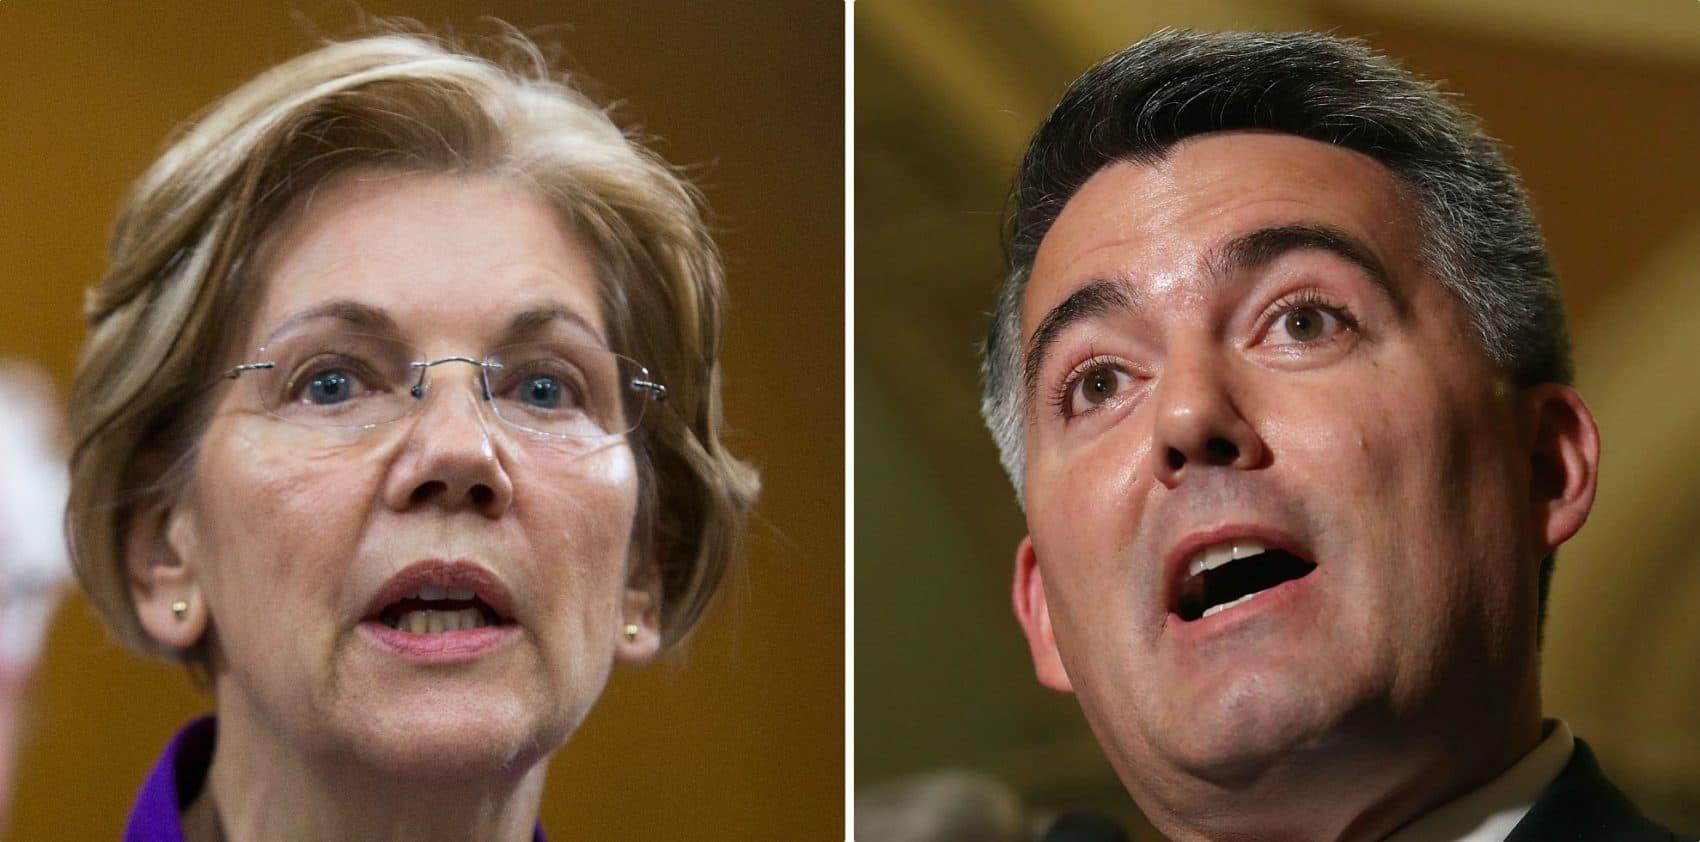 Sen. Elizabeth Warren (D-Mass.) and Sen. Cory Gardner (R-Colo.). (Tasos Katopodis and Mark Wilson/Getty Images)